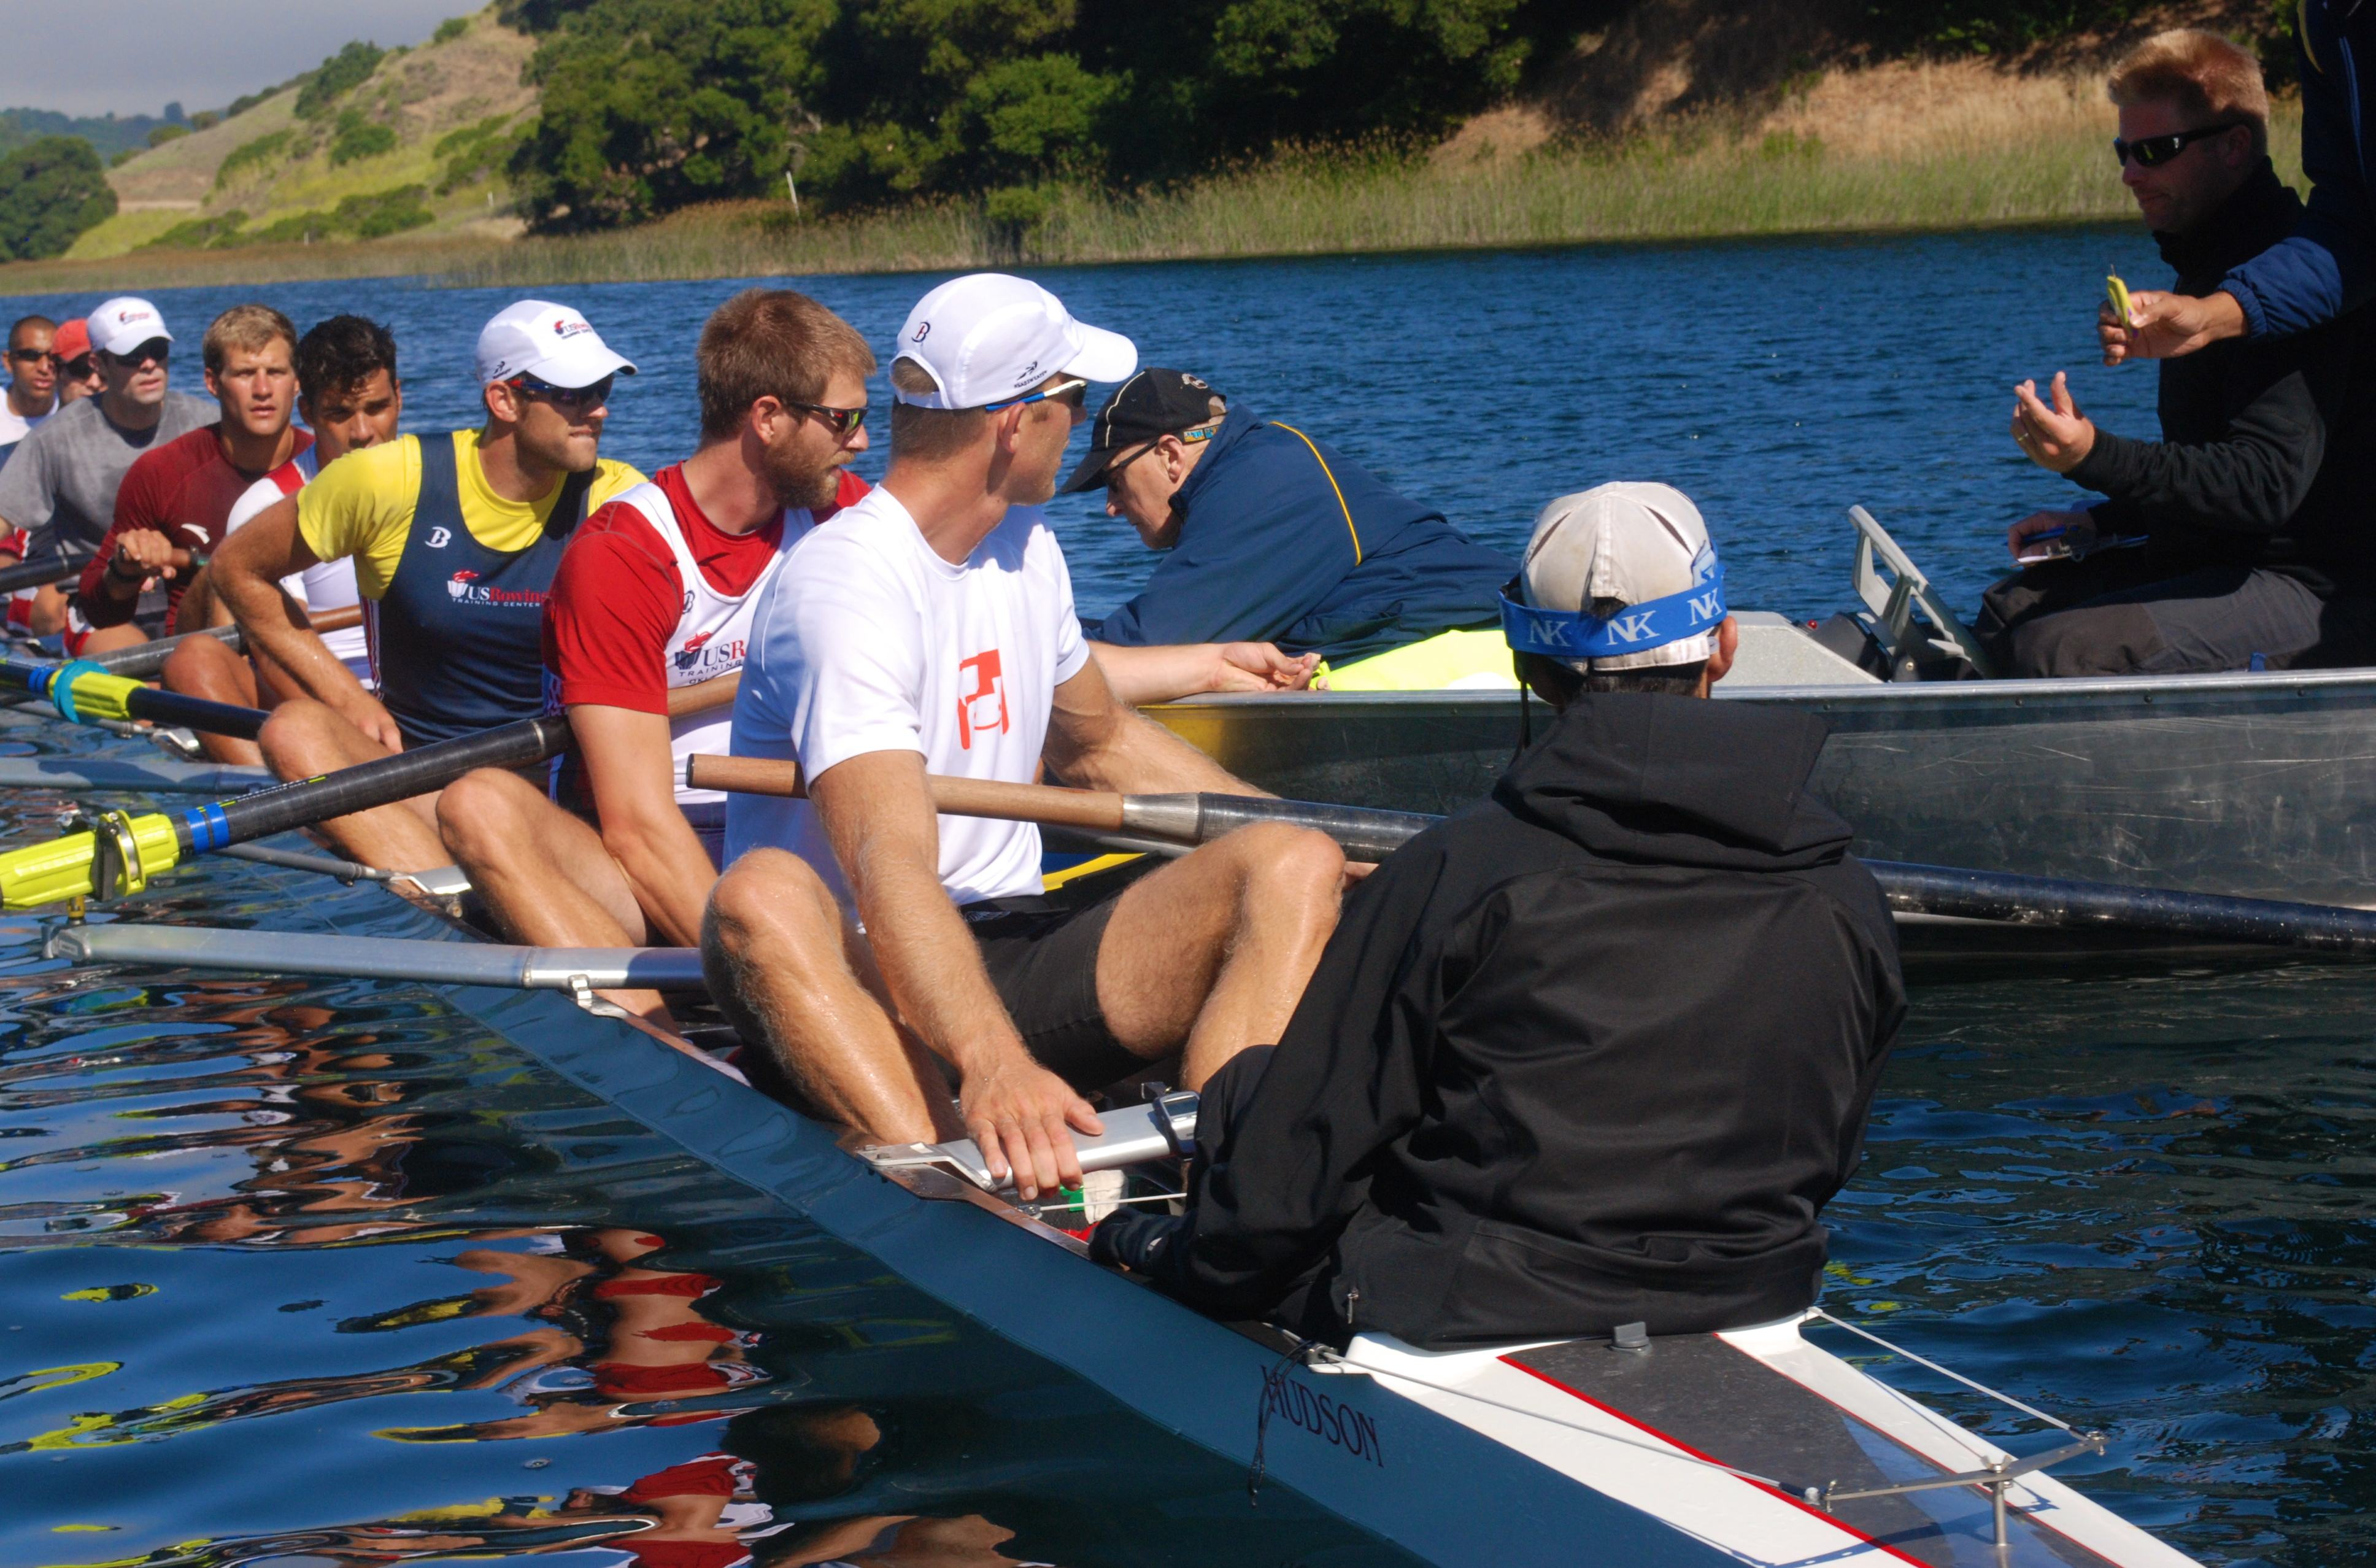 2012-07-09-photorowingolympics.jpg